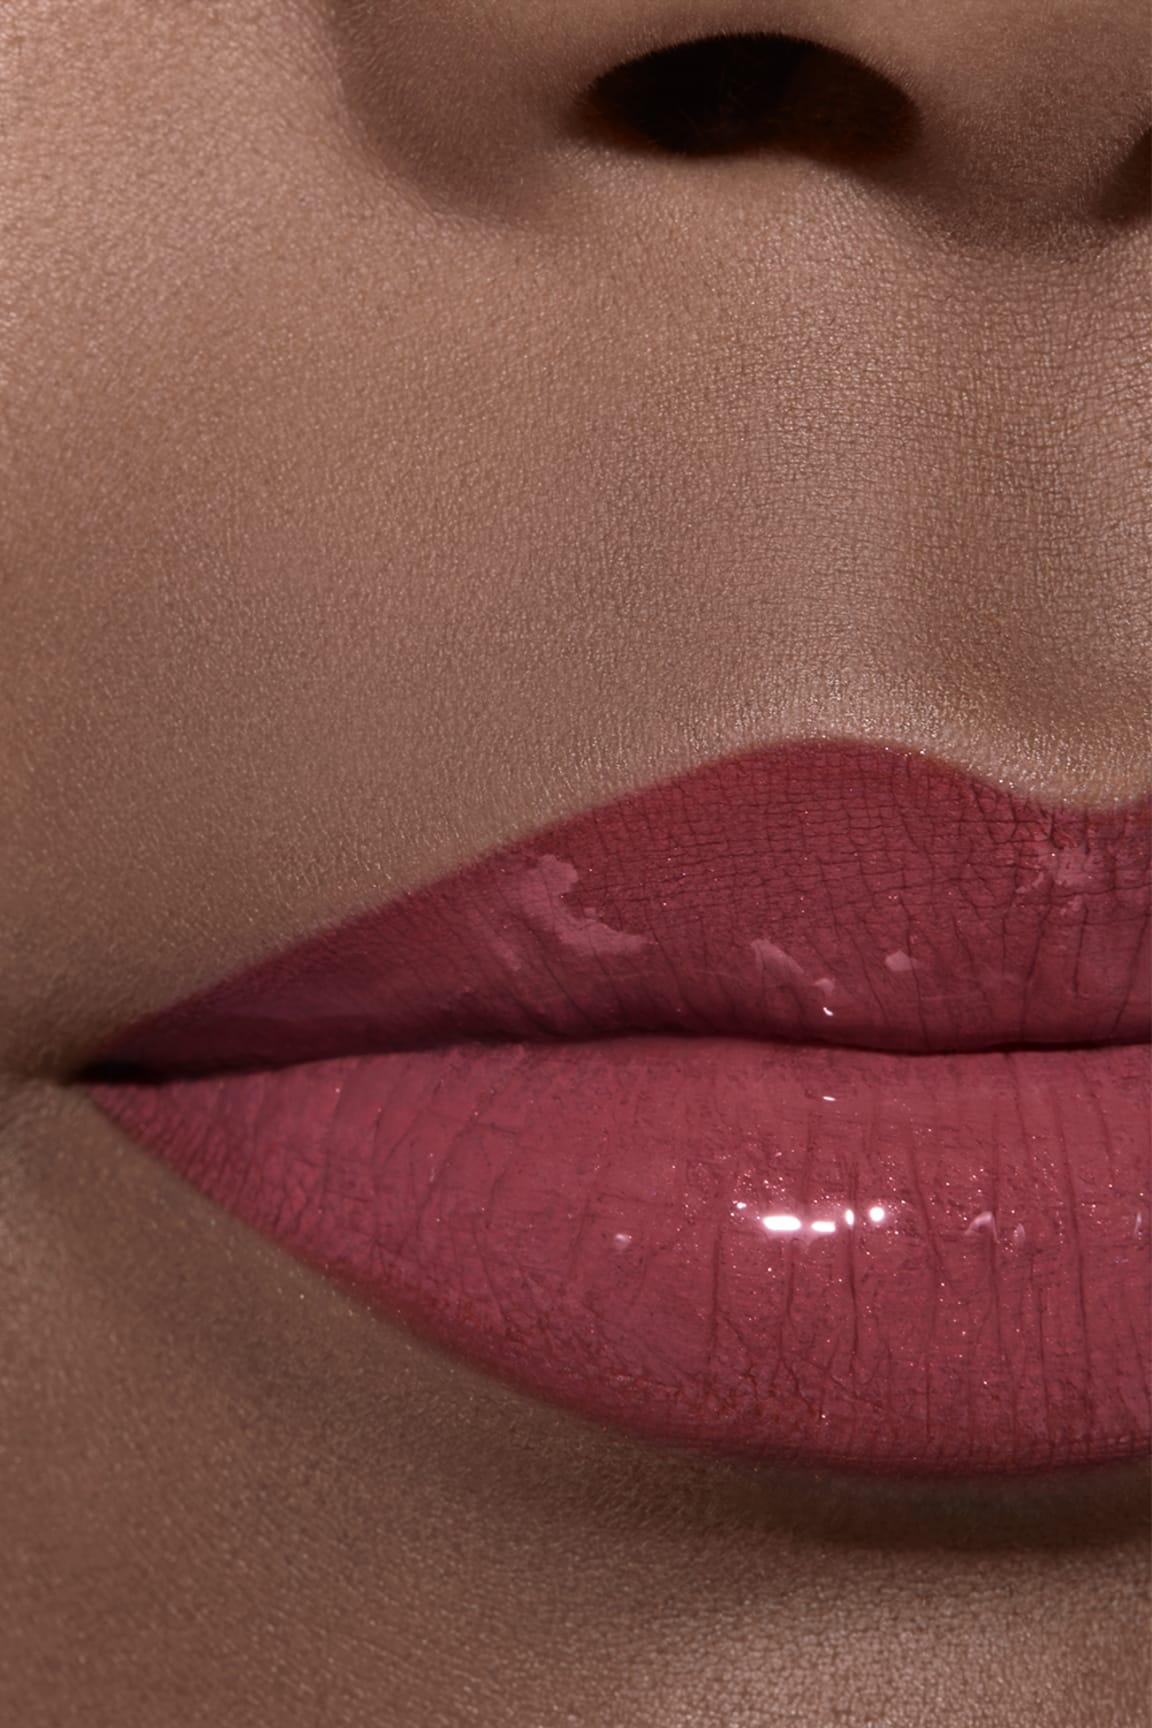 Application makeup visual 2 - LE ROUGE DUO ULTRA TENUE 57 - DARLING PINK